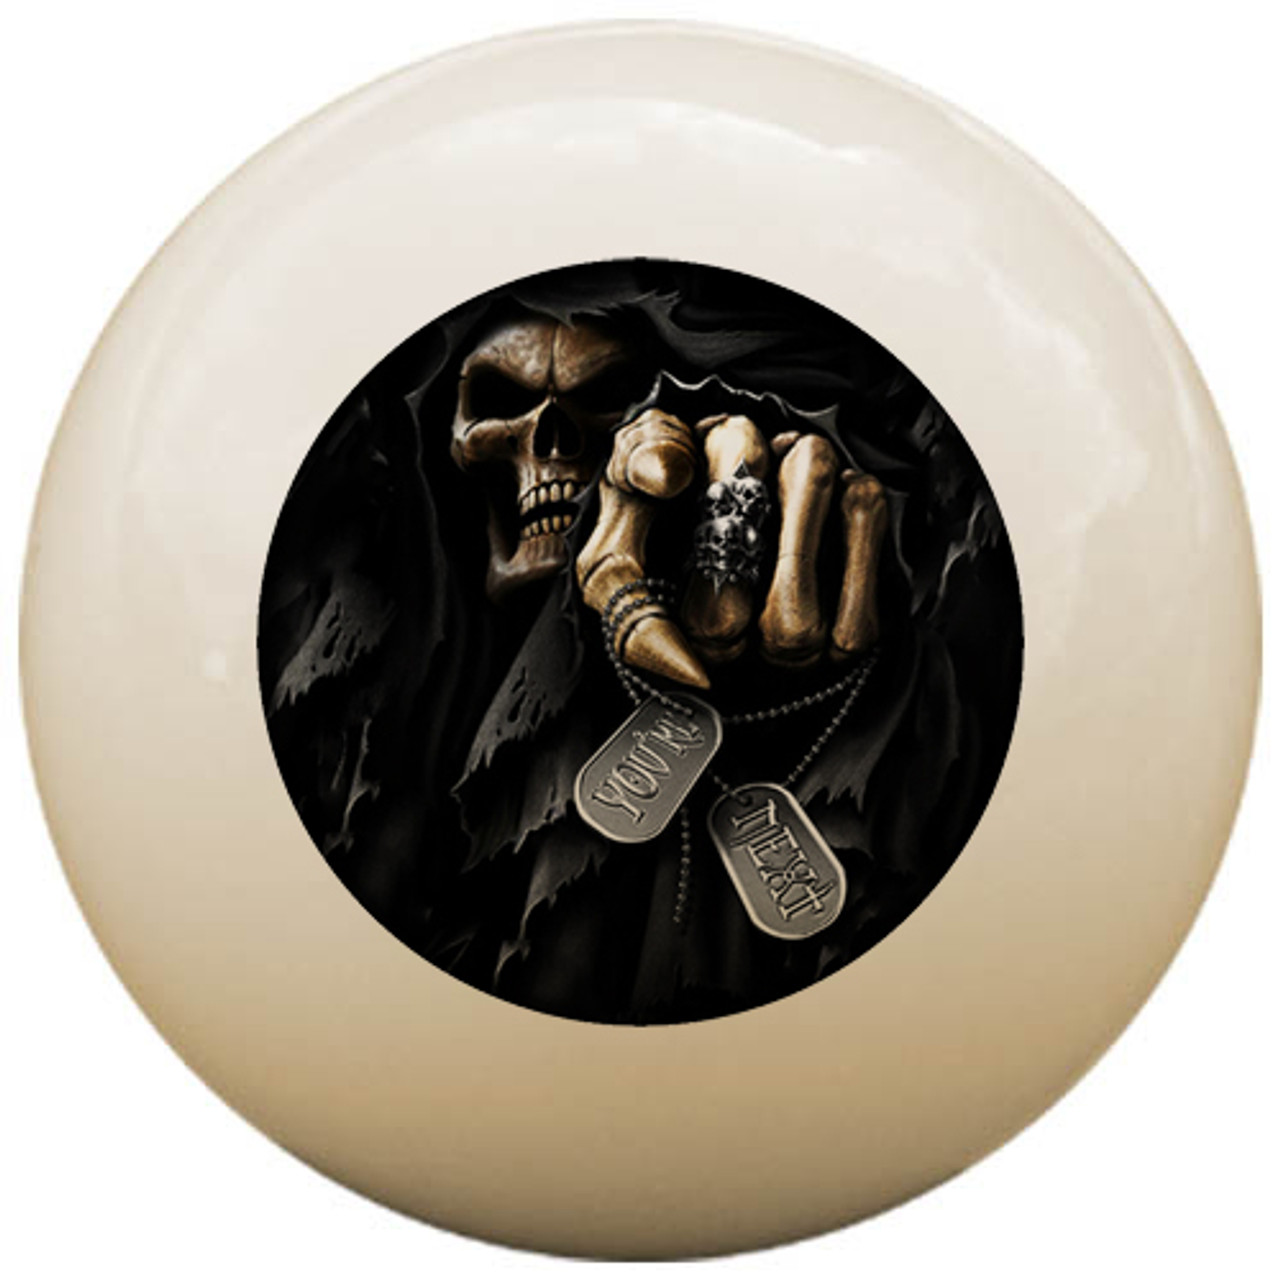 Custom Pool Cue Ball - Skull